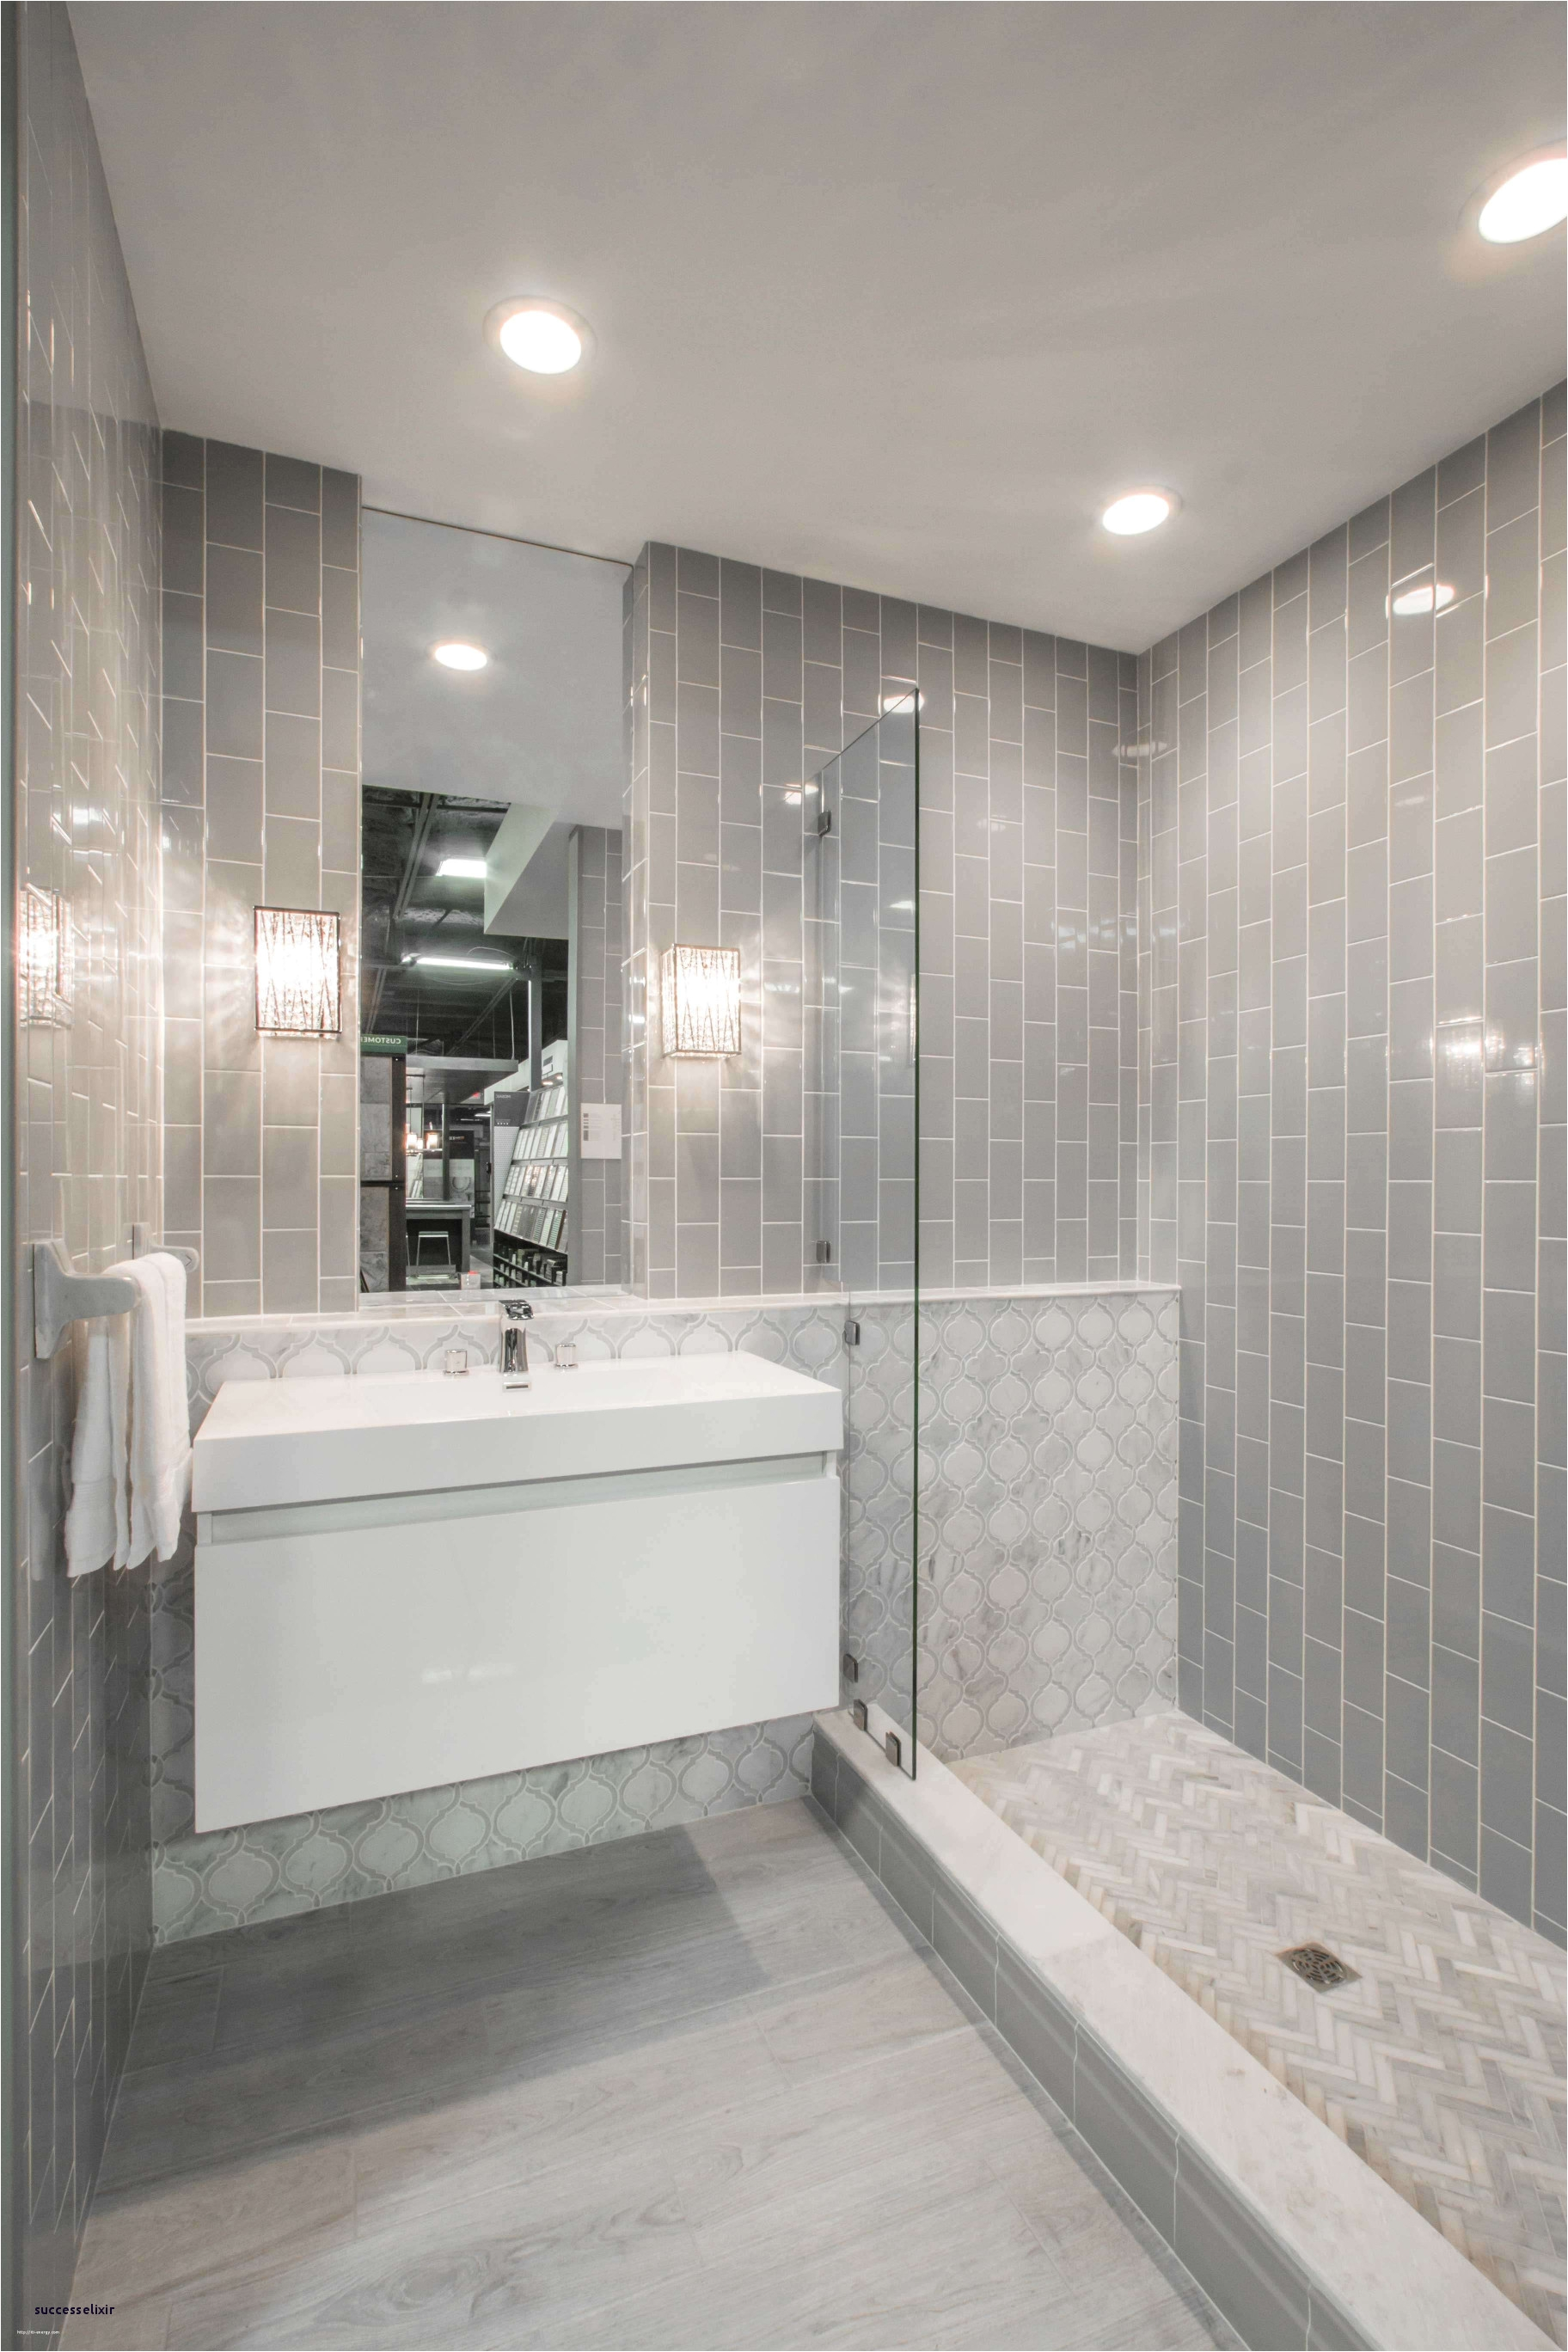 bathroom shower images beautiful 24 luxury tile ideas for bathrooms ideas